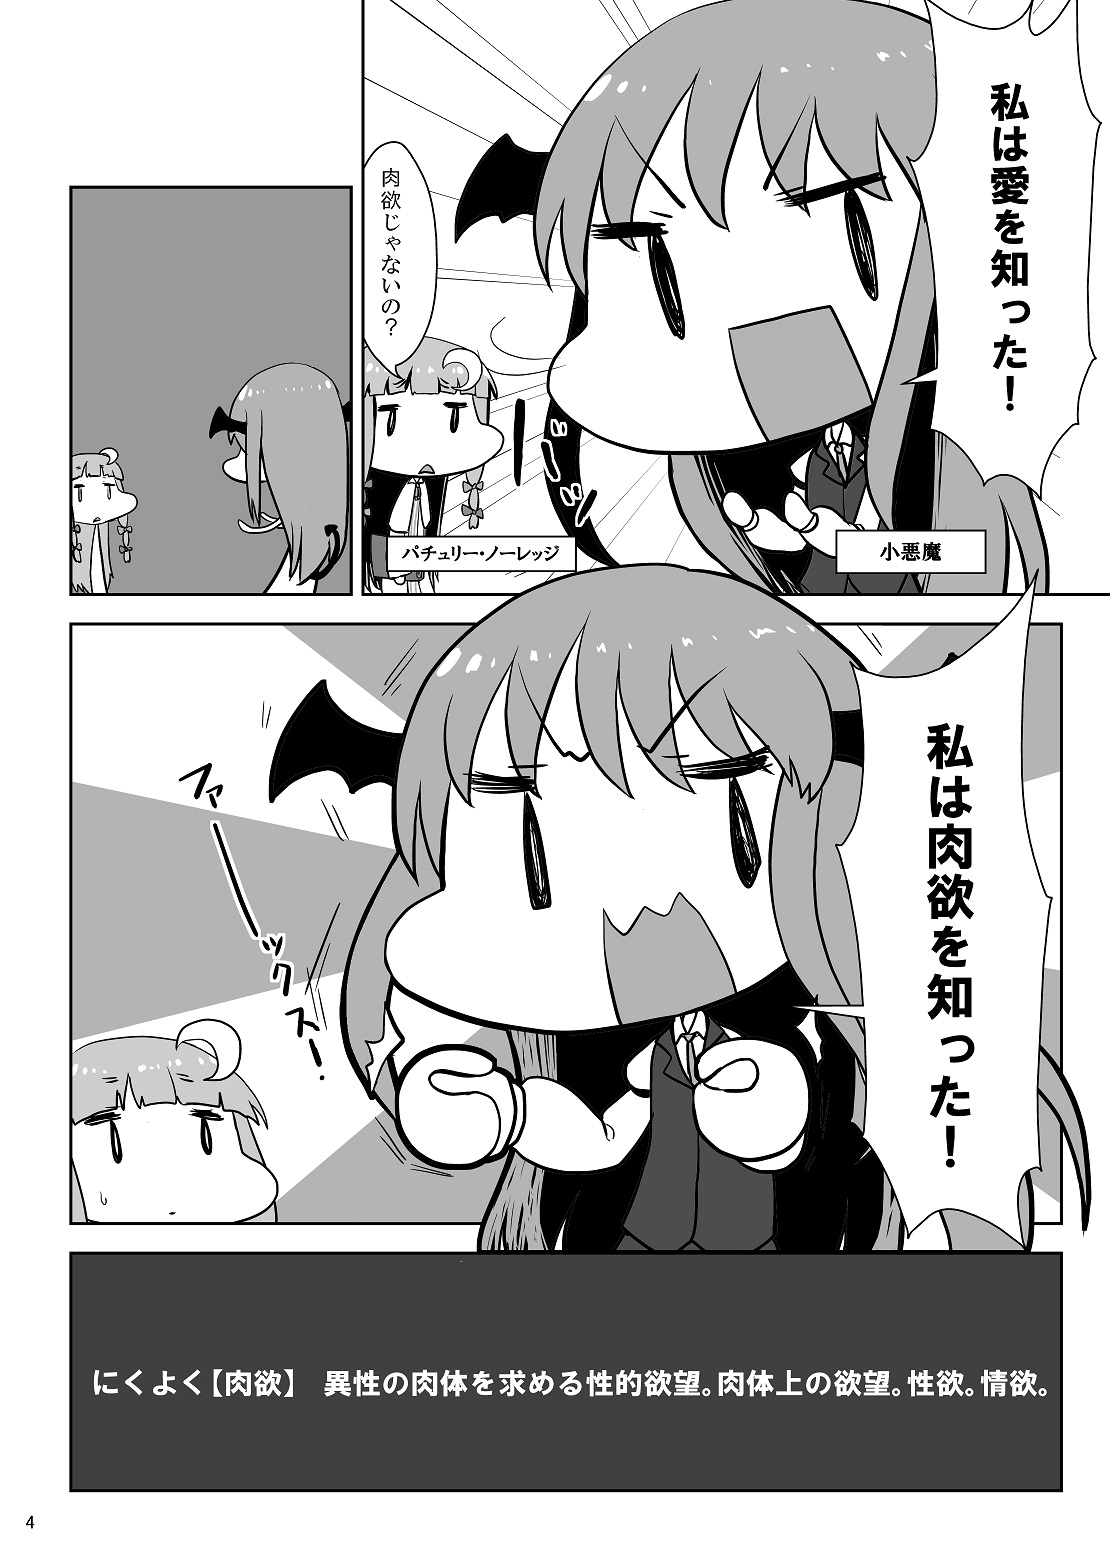 re12本文0004